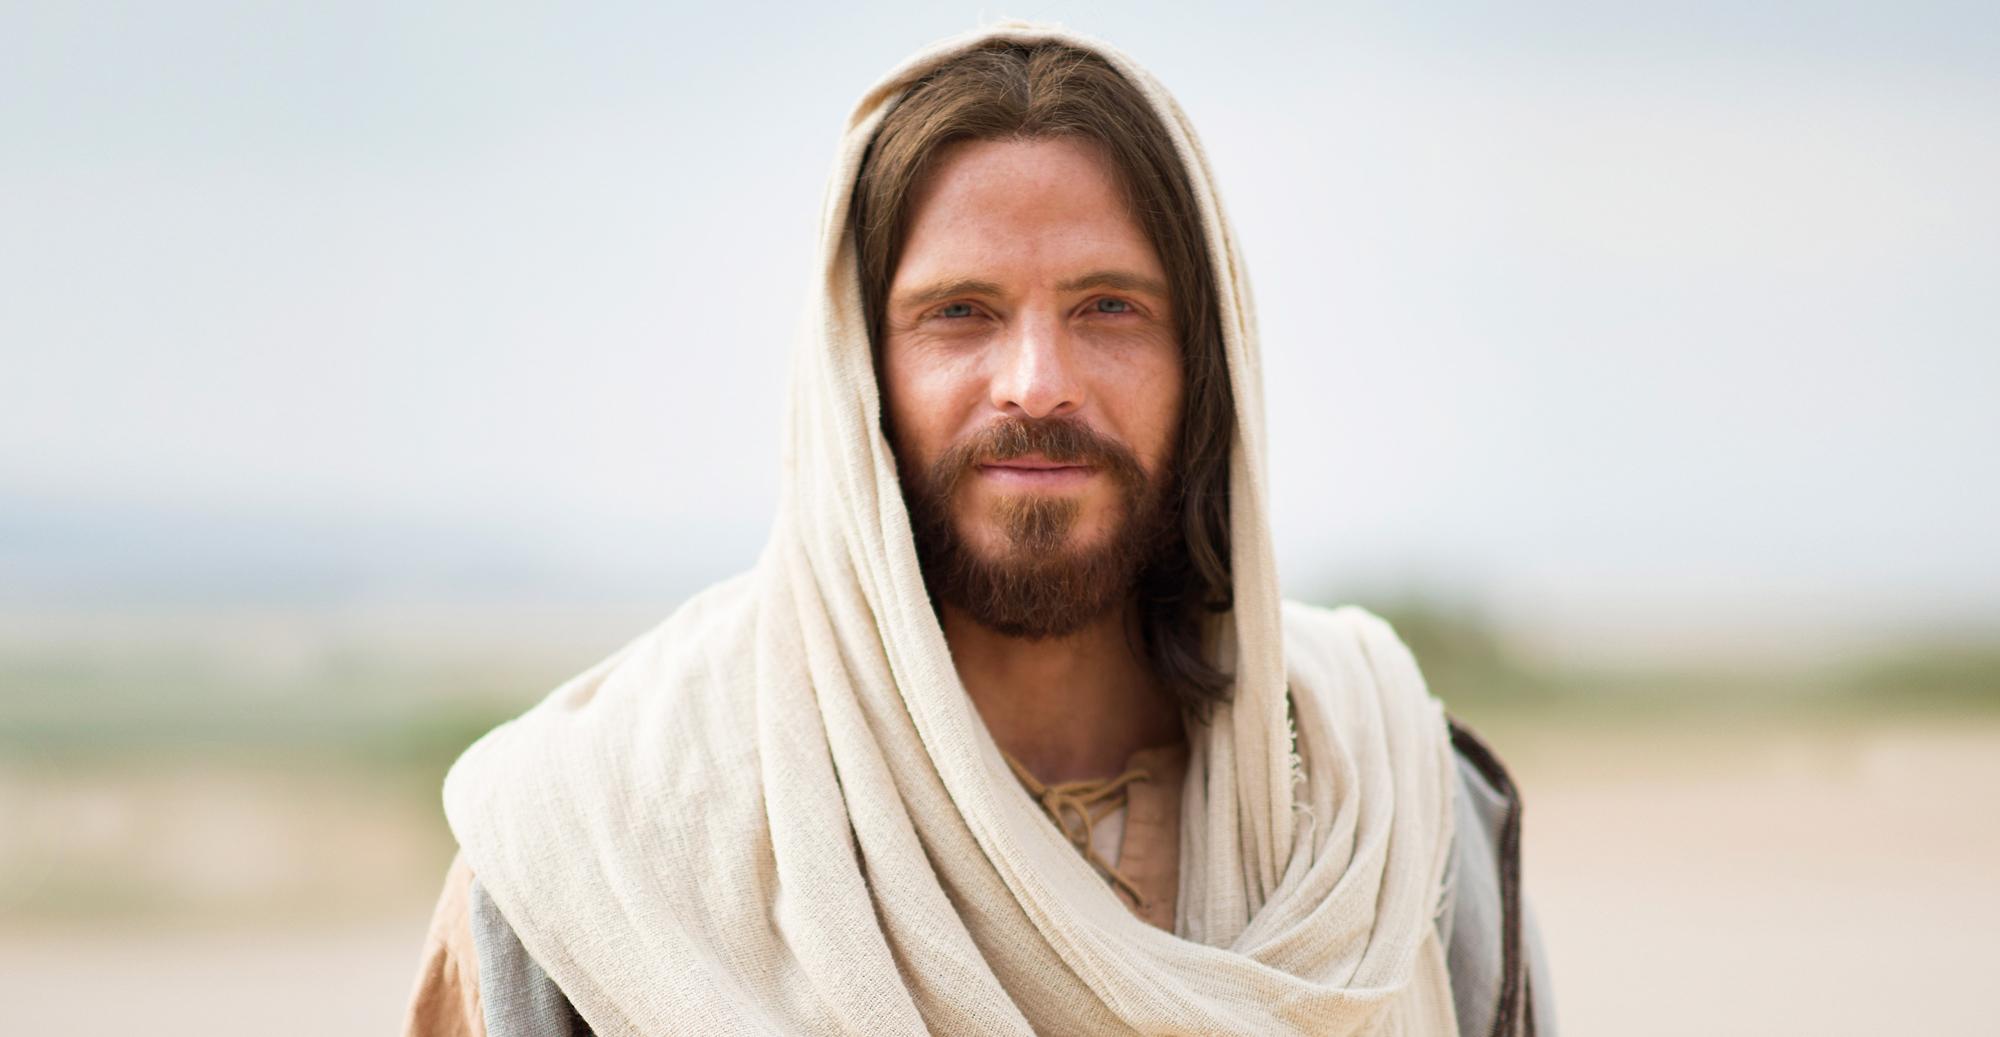 Jesus Christ via lds.org